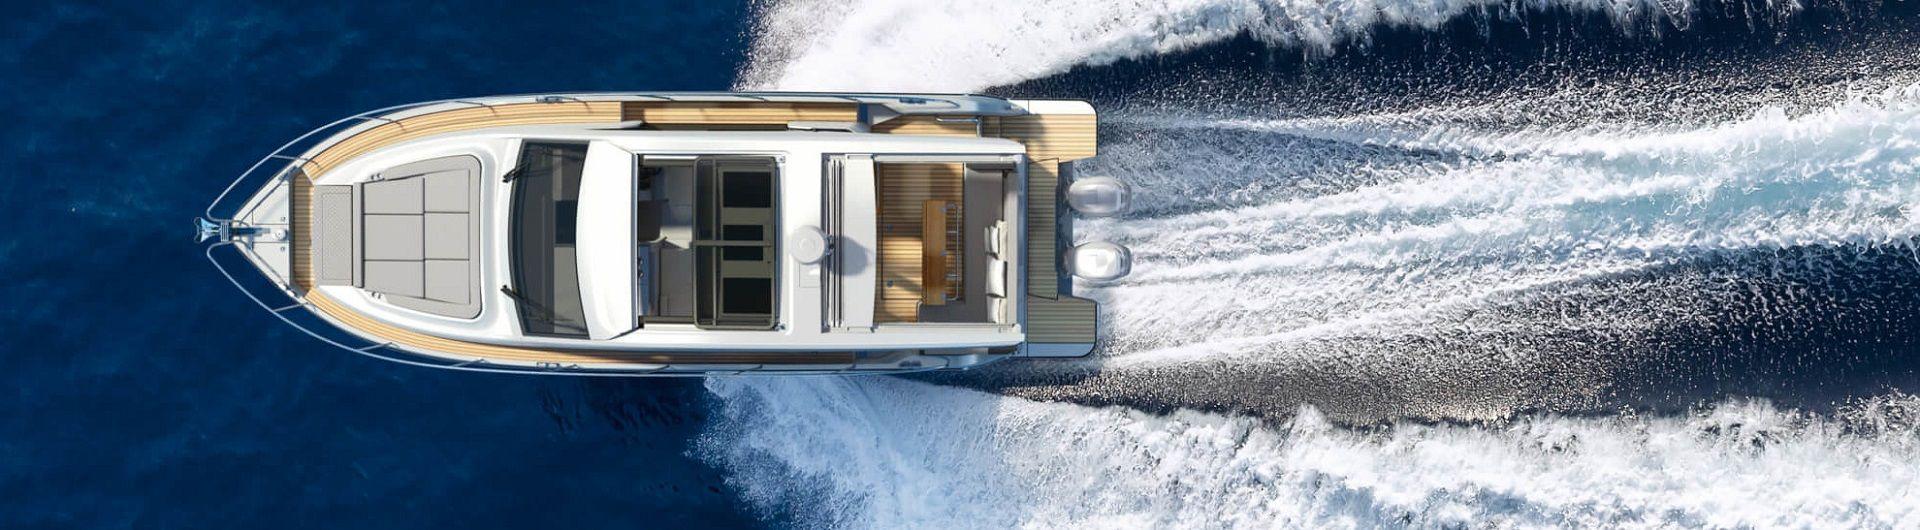 Sportboot Sealine C390v Header